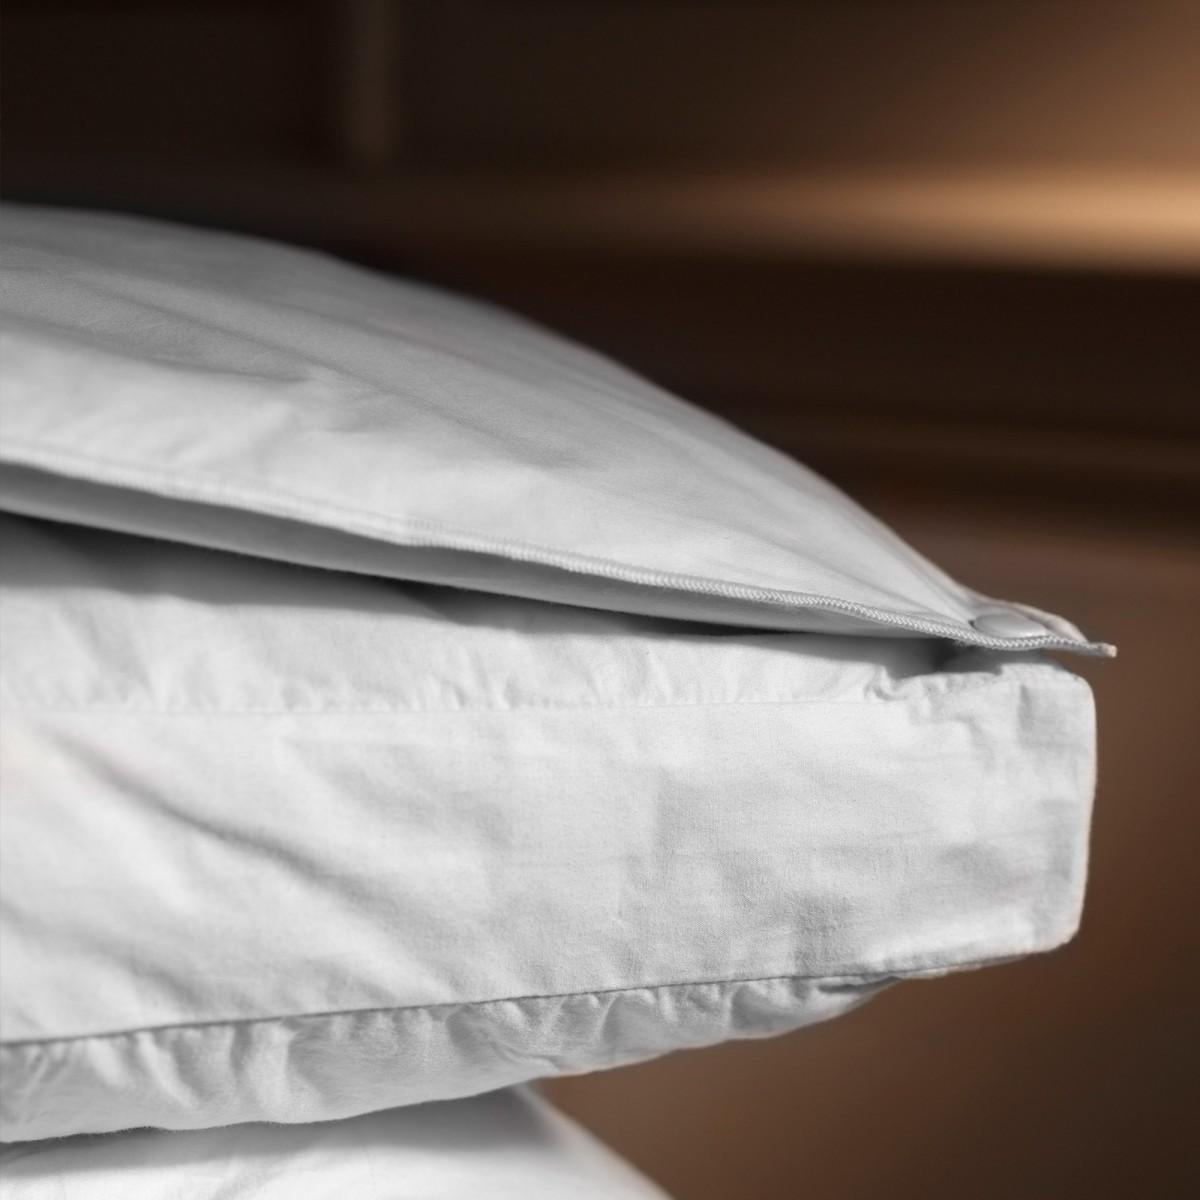 surmatelas plume prestige naturel effet nuage dumas paris. Black Bedroom Furniture Sets. Home Design Ideas